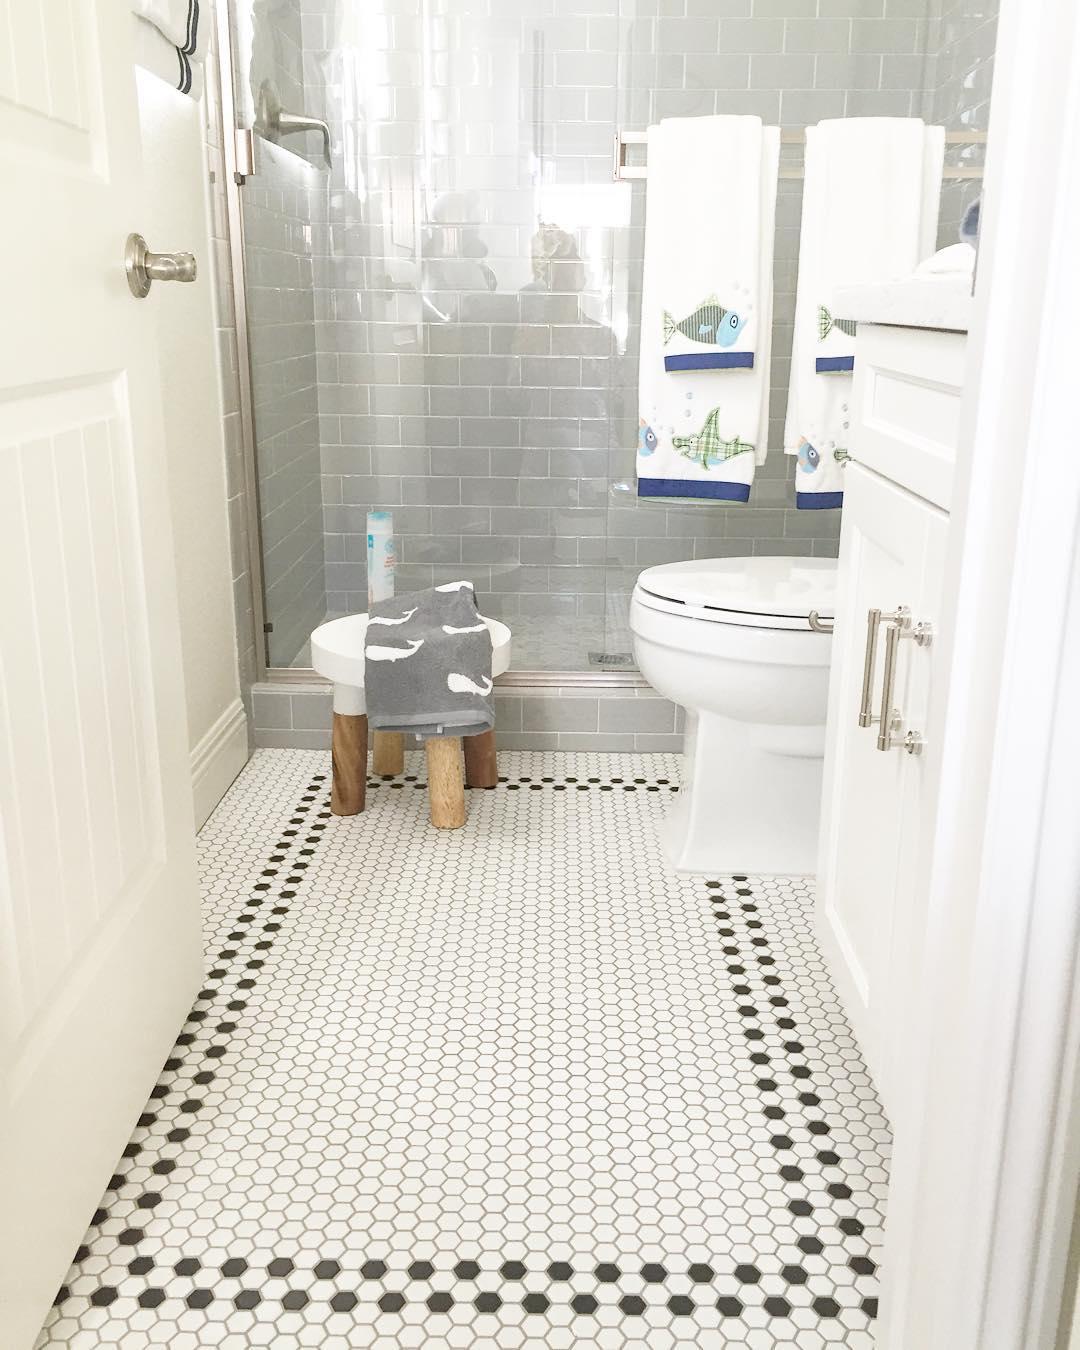 23+ Bathroom Tiles Designs | Bathroom Designs | Design ... on Floral Tile Bathroom Ideas  id=60406